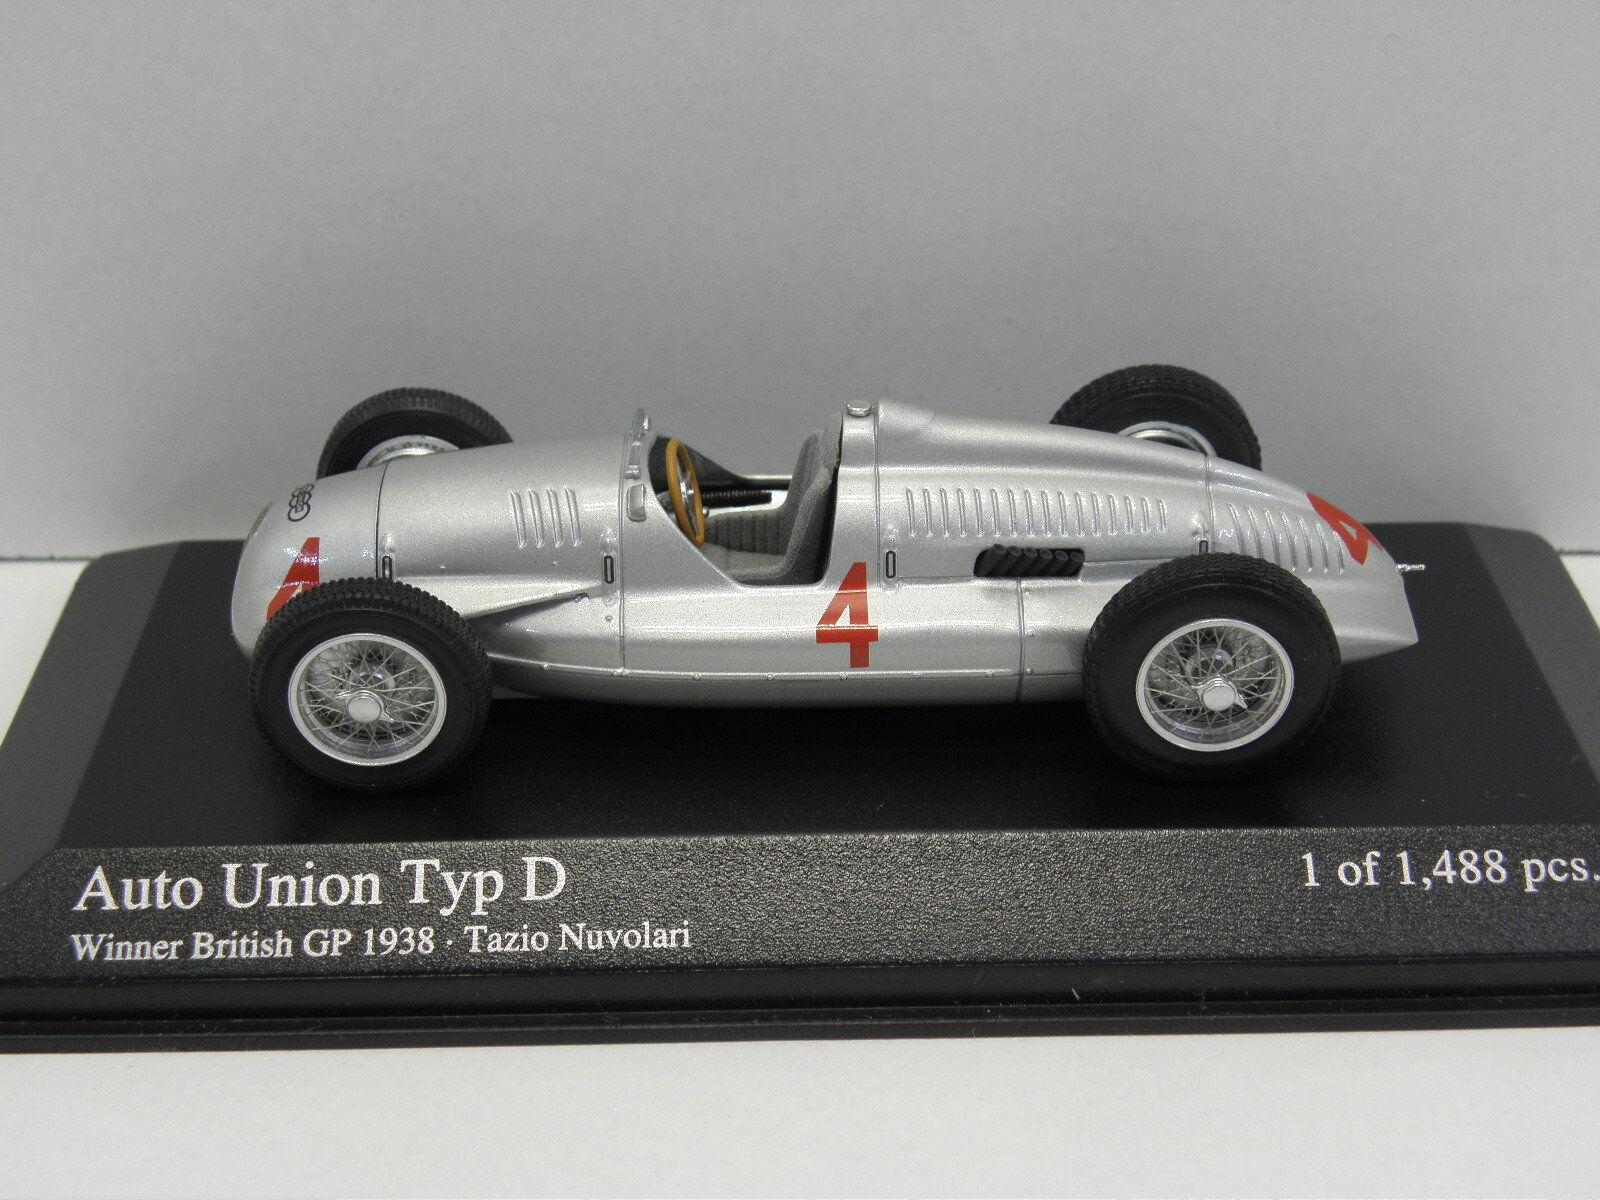 MINICHAMPS 400380004 sammelmodell AUTO UNION TYPE D winner BRITISH GP 1938 M .1  43